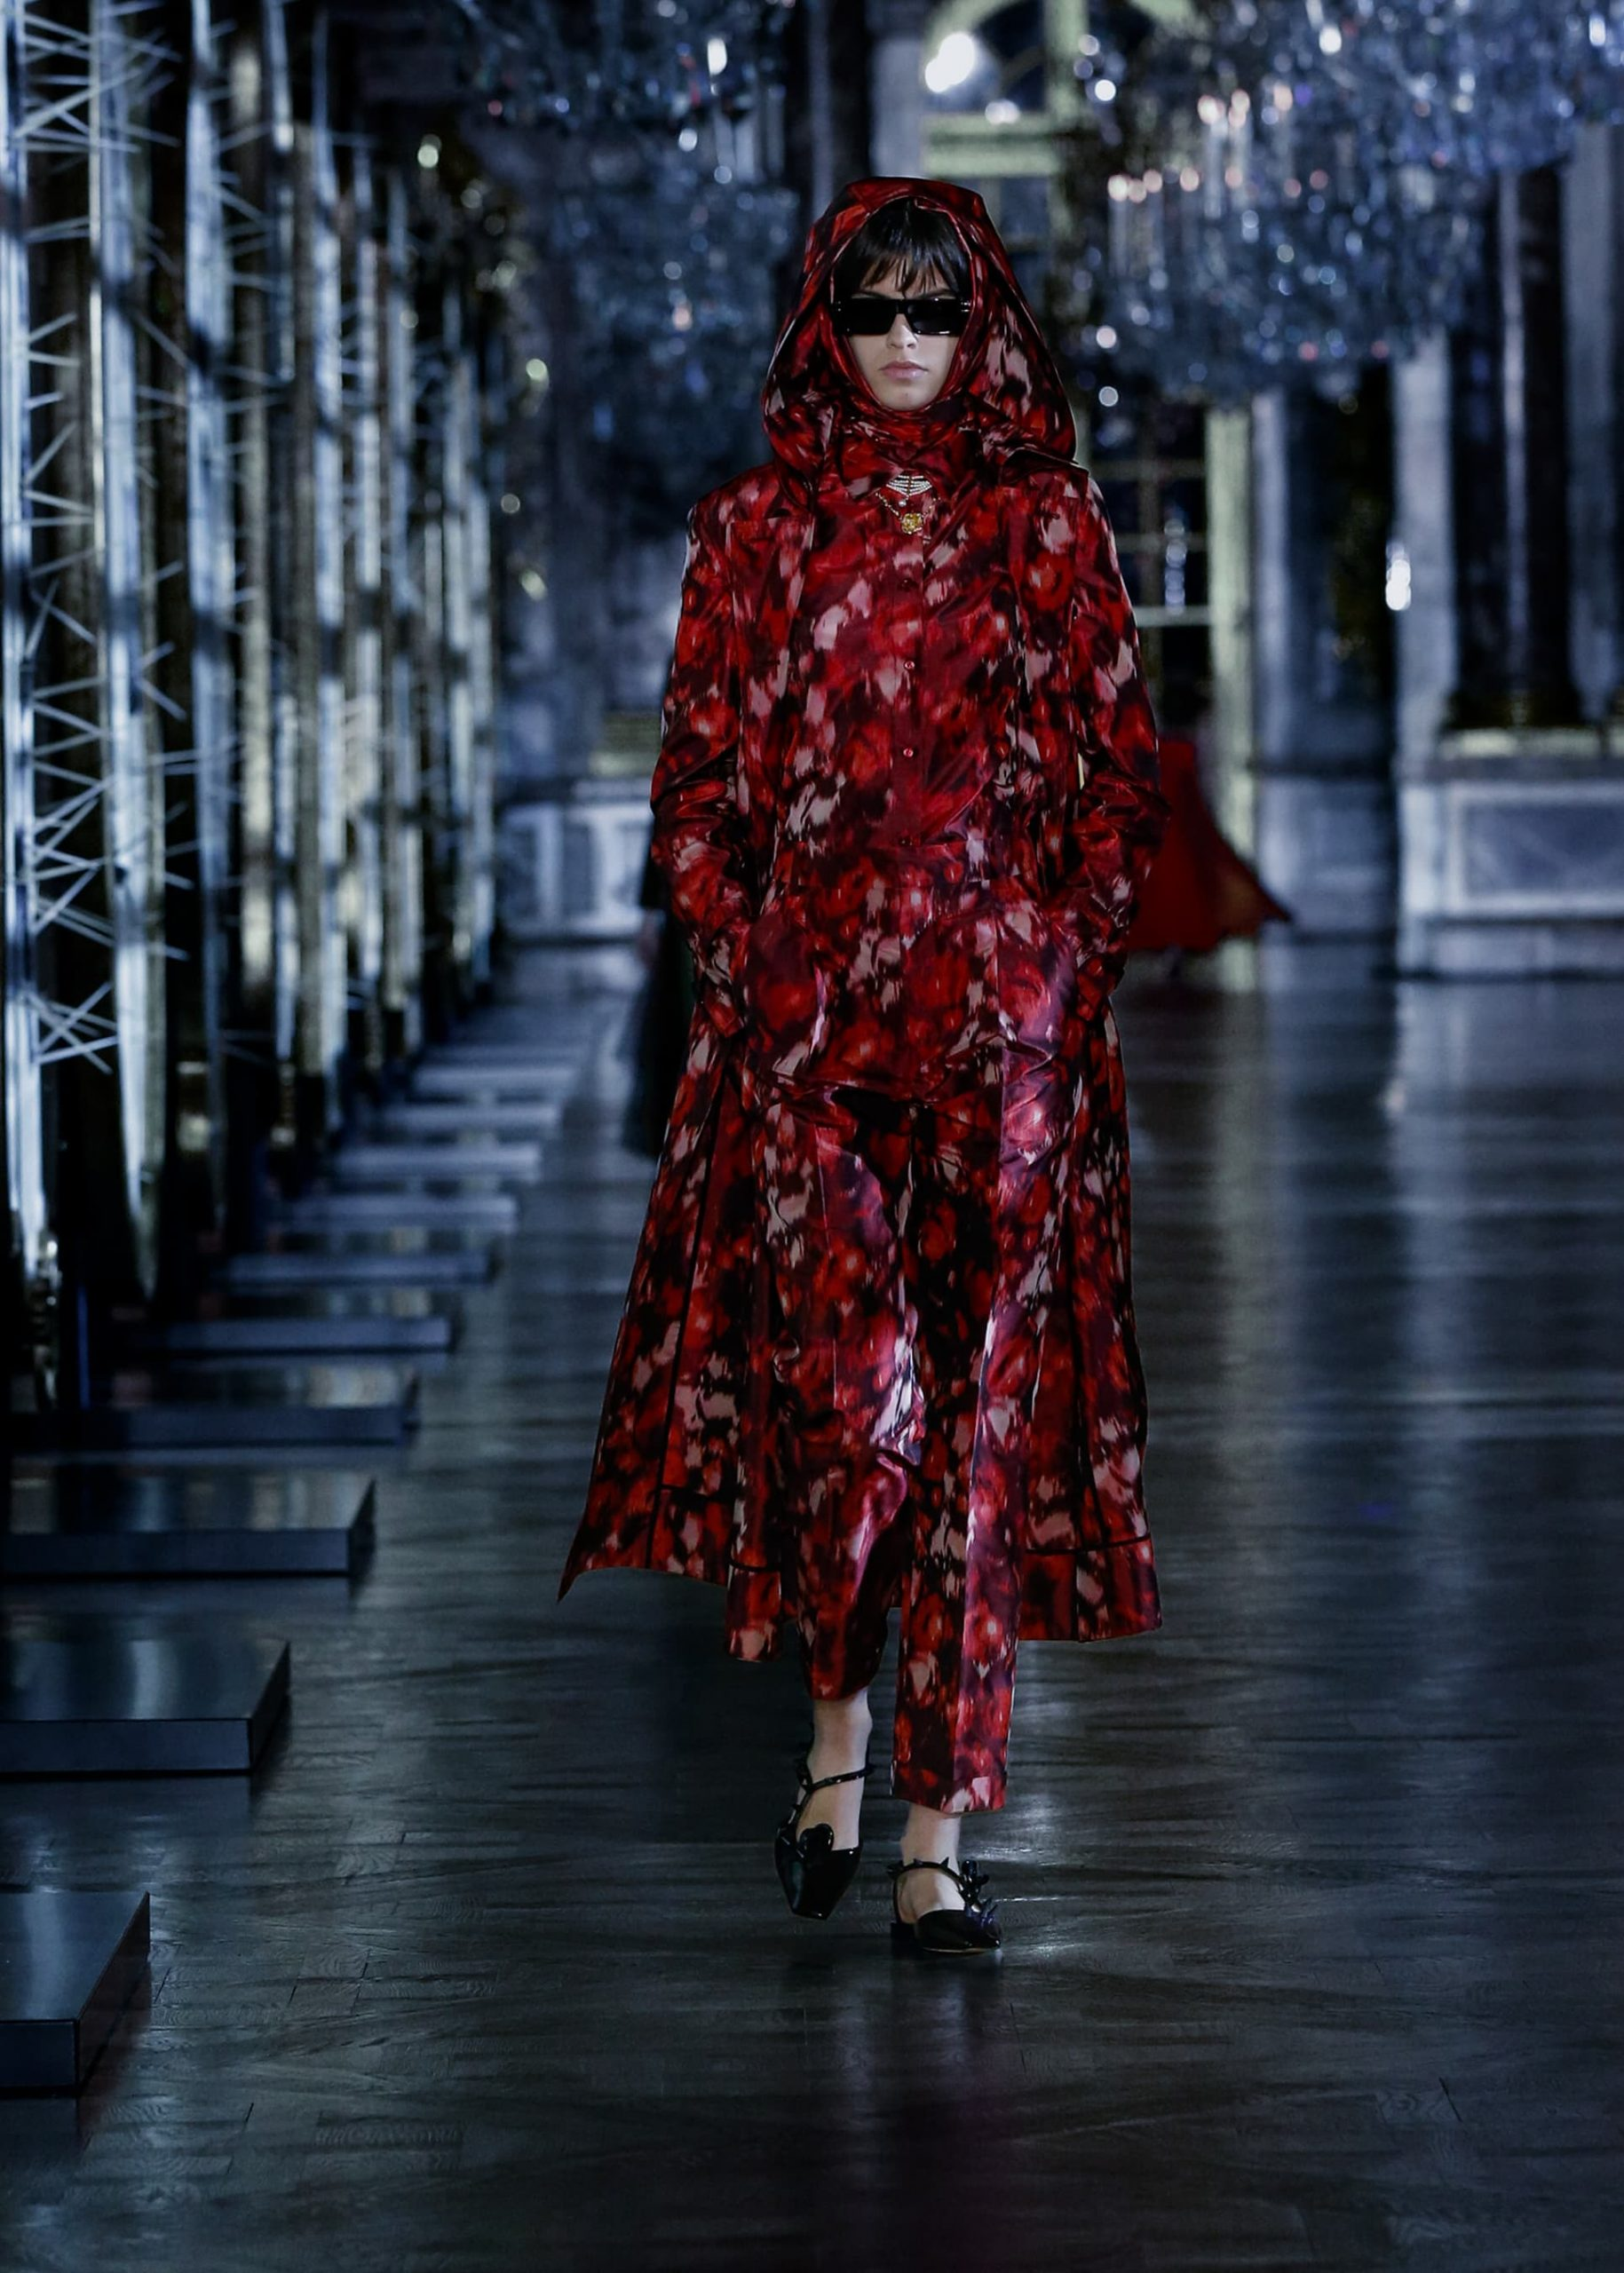 Dior Fall 2021 Fashion Show Review